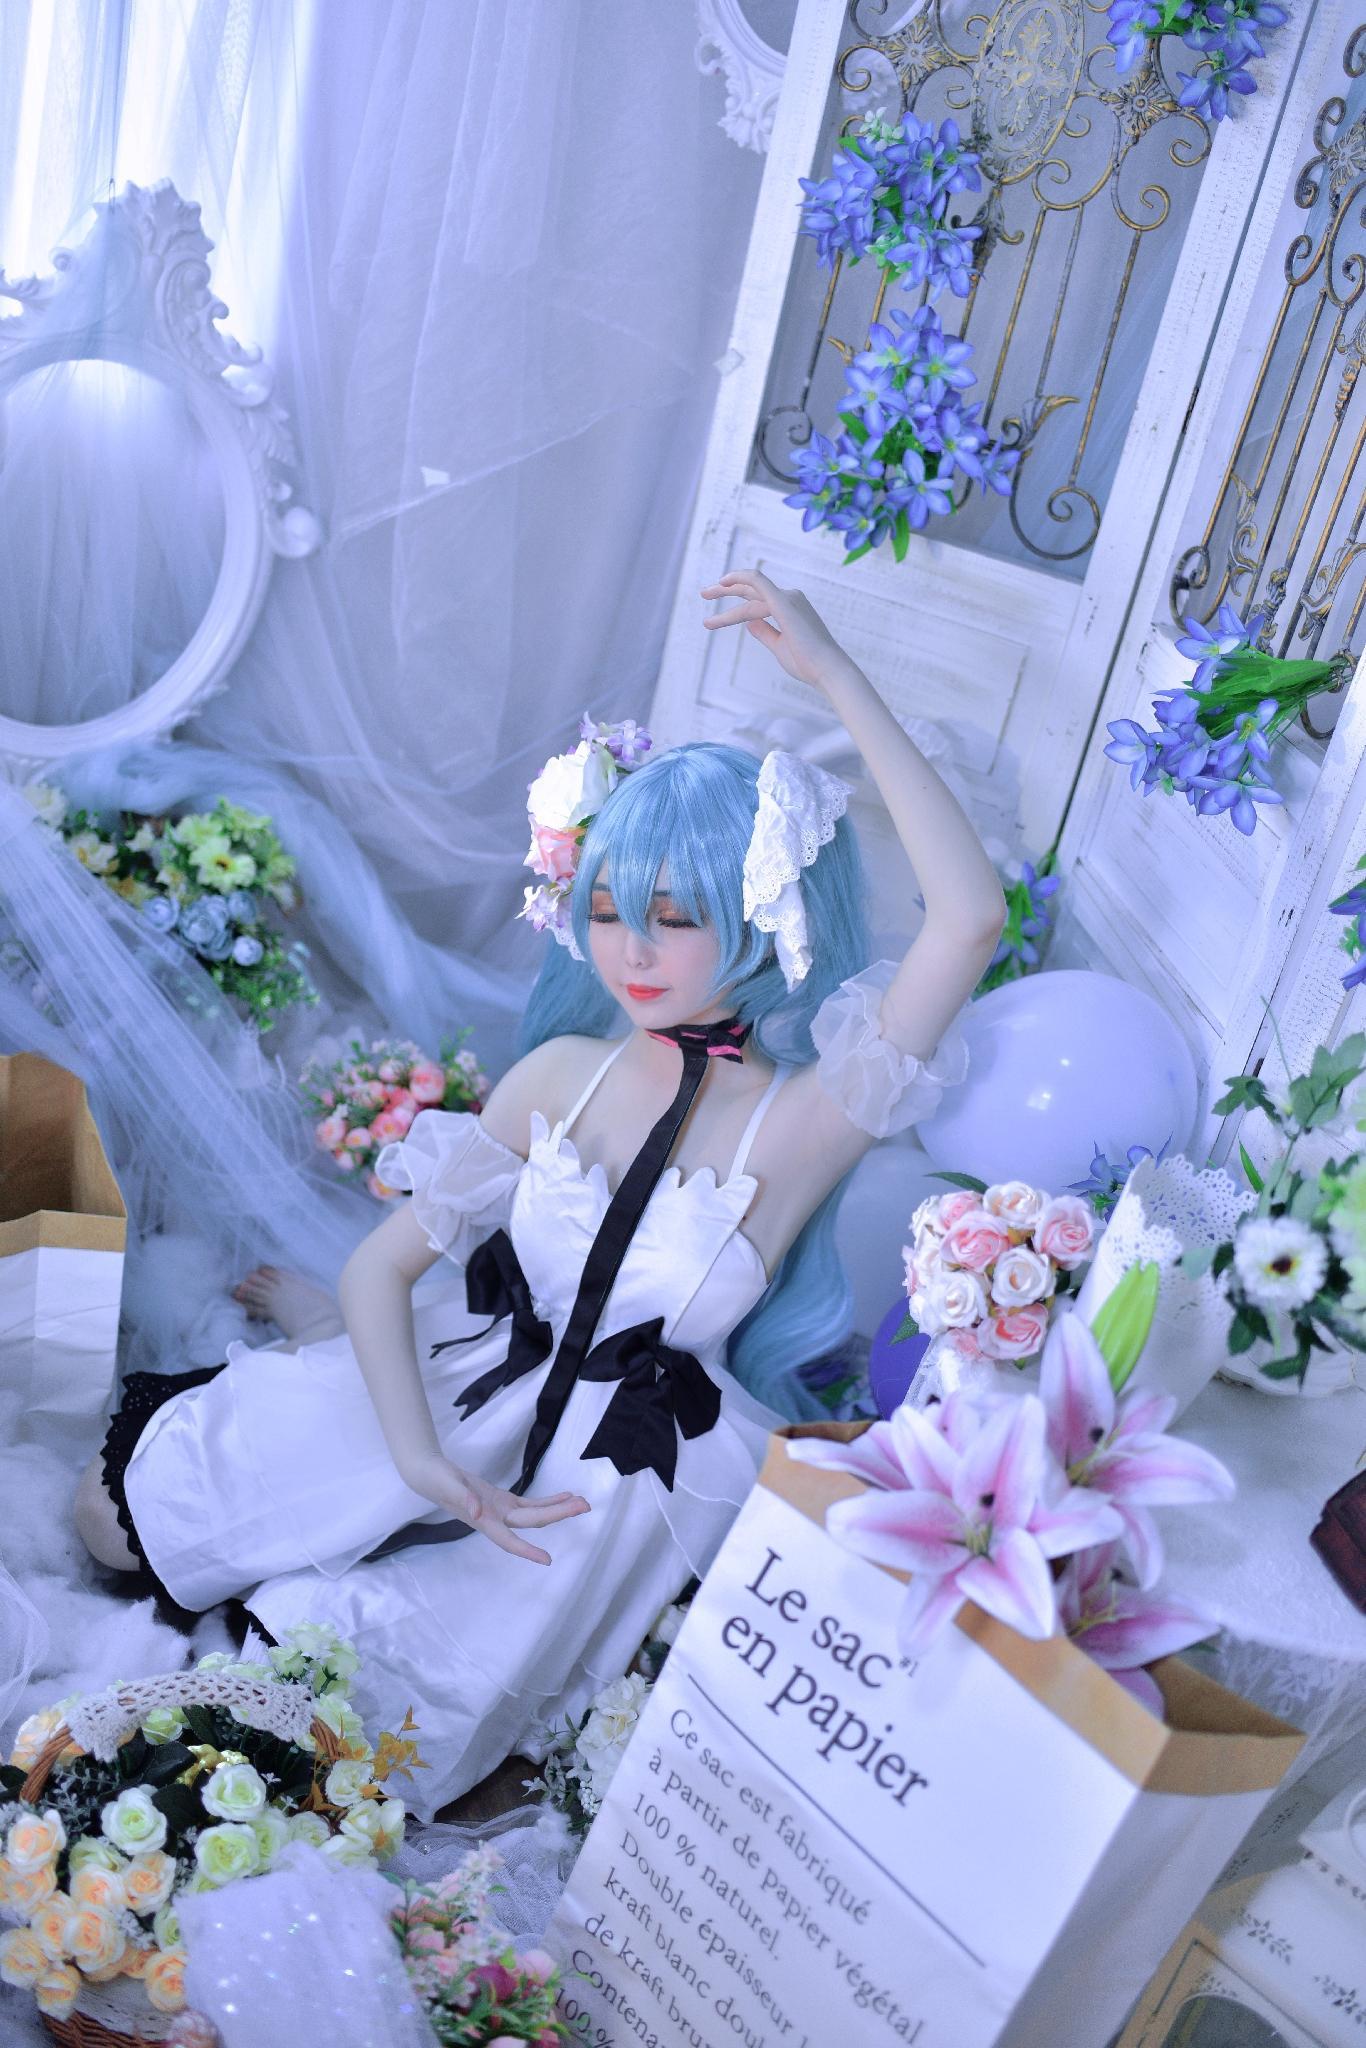 《VOCALOID》精灵cosplay【CN:果锅_LEH】-第4张